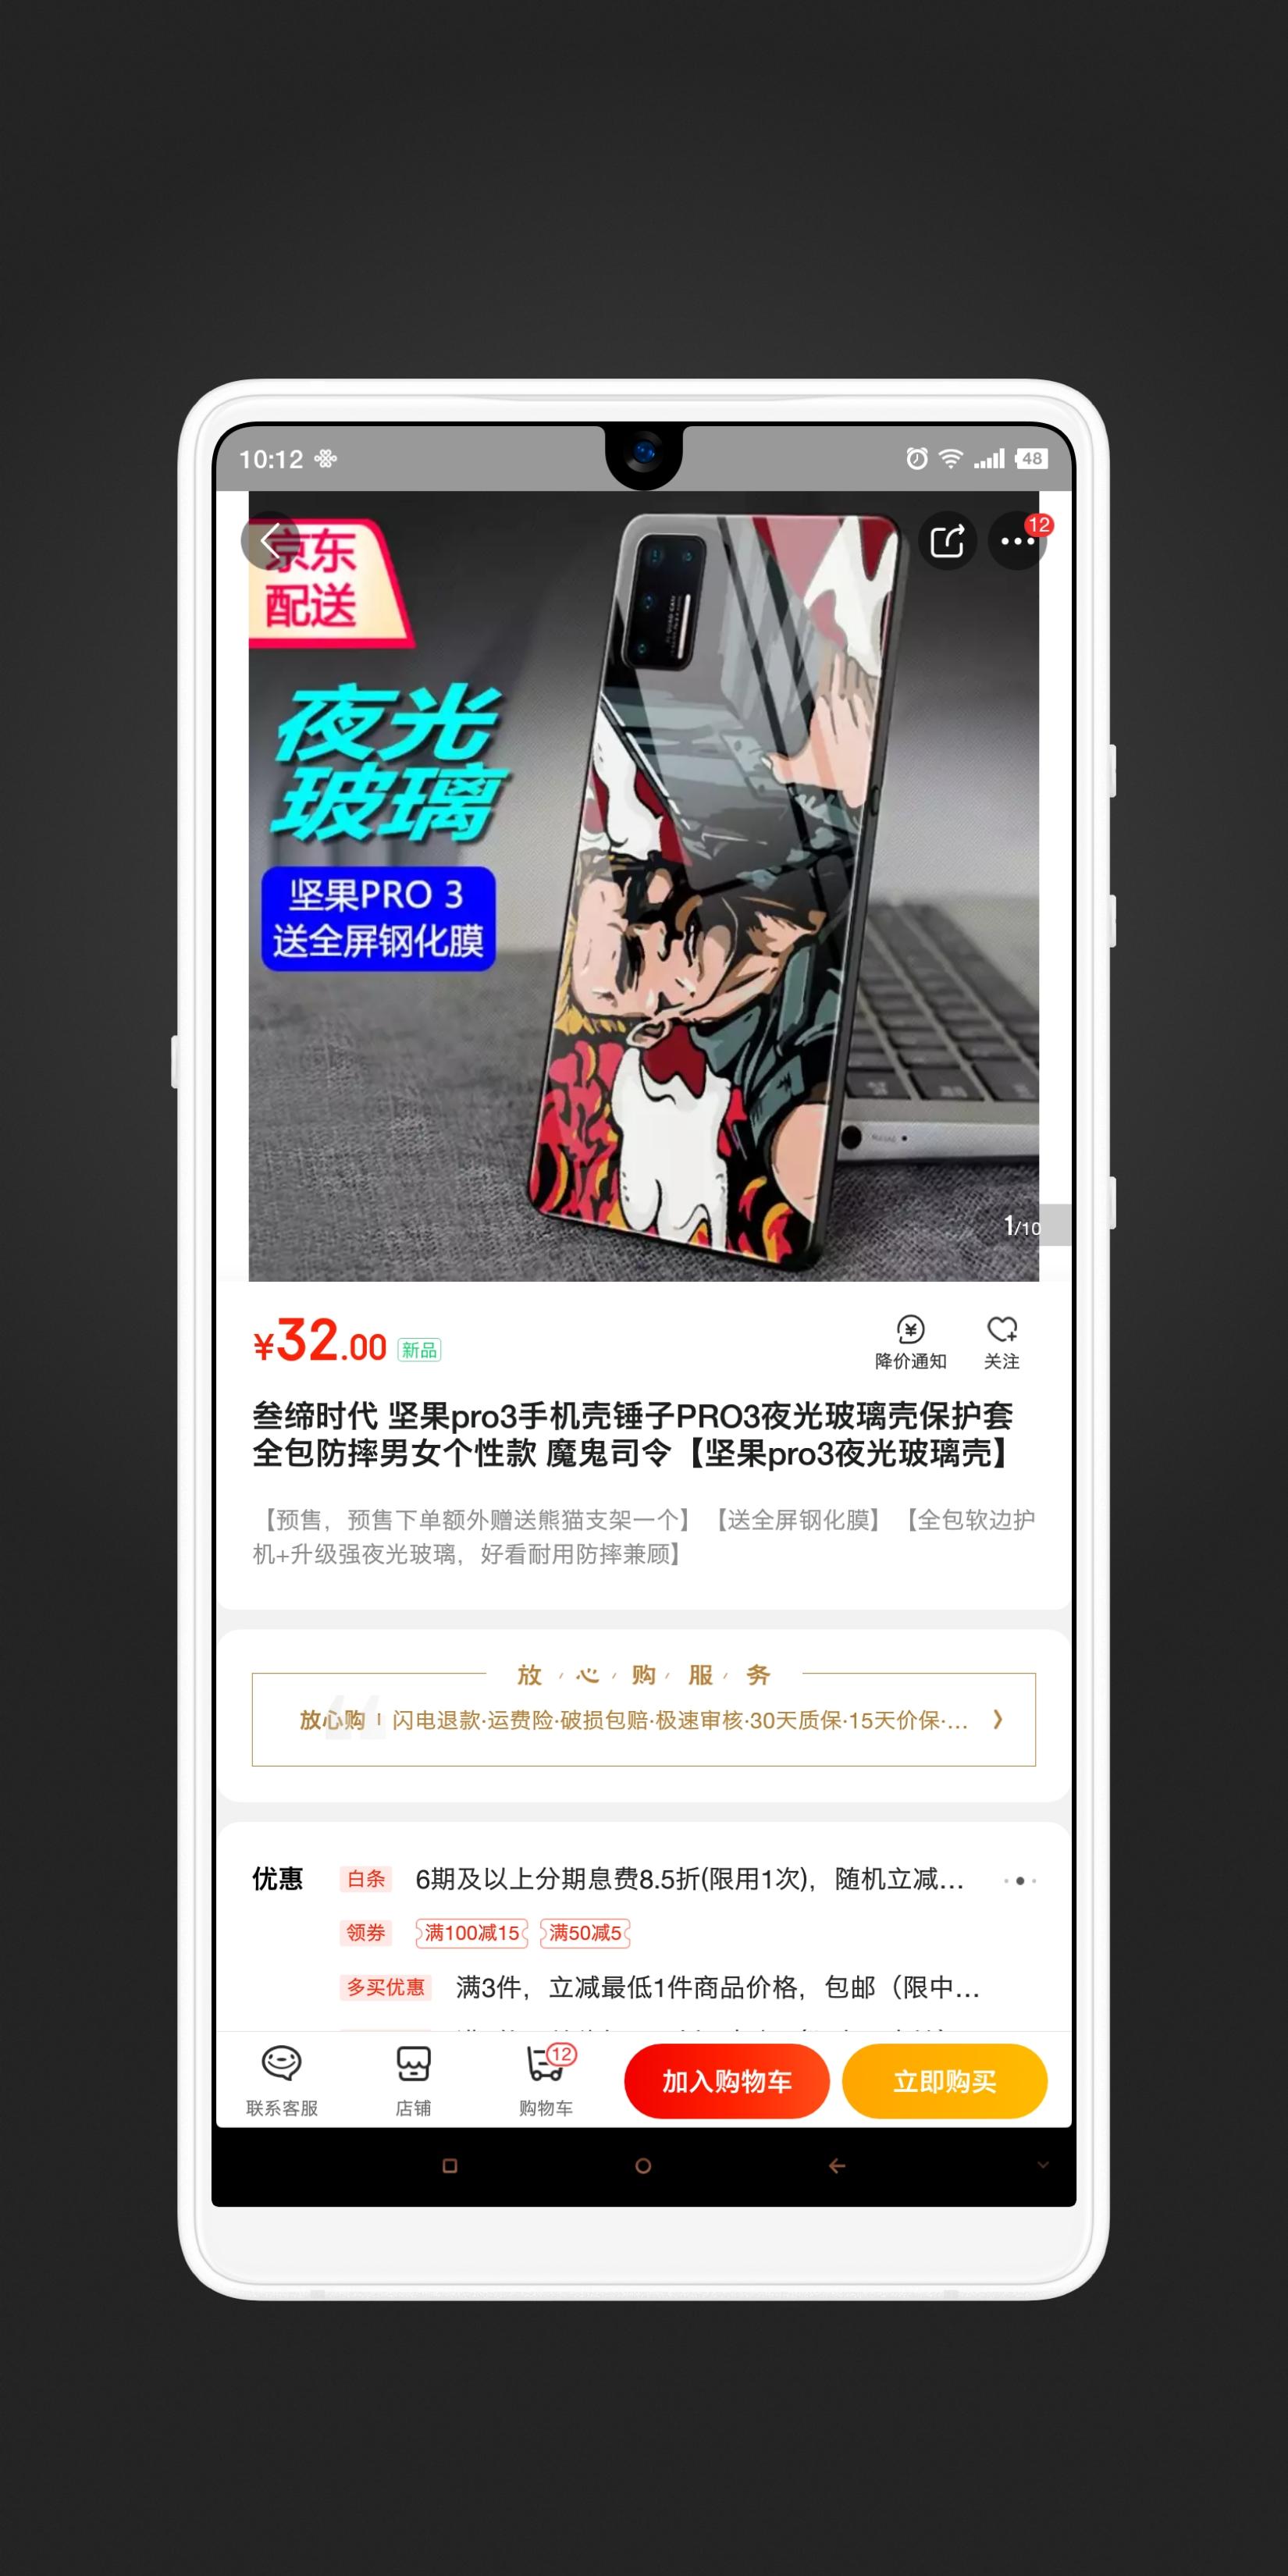 Screenshot_2019-11-16-10-12-24-413_??.png